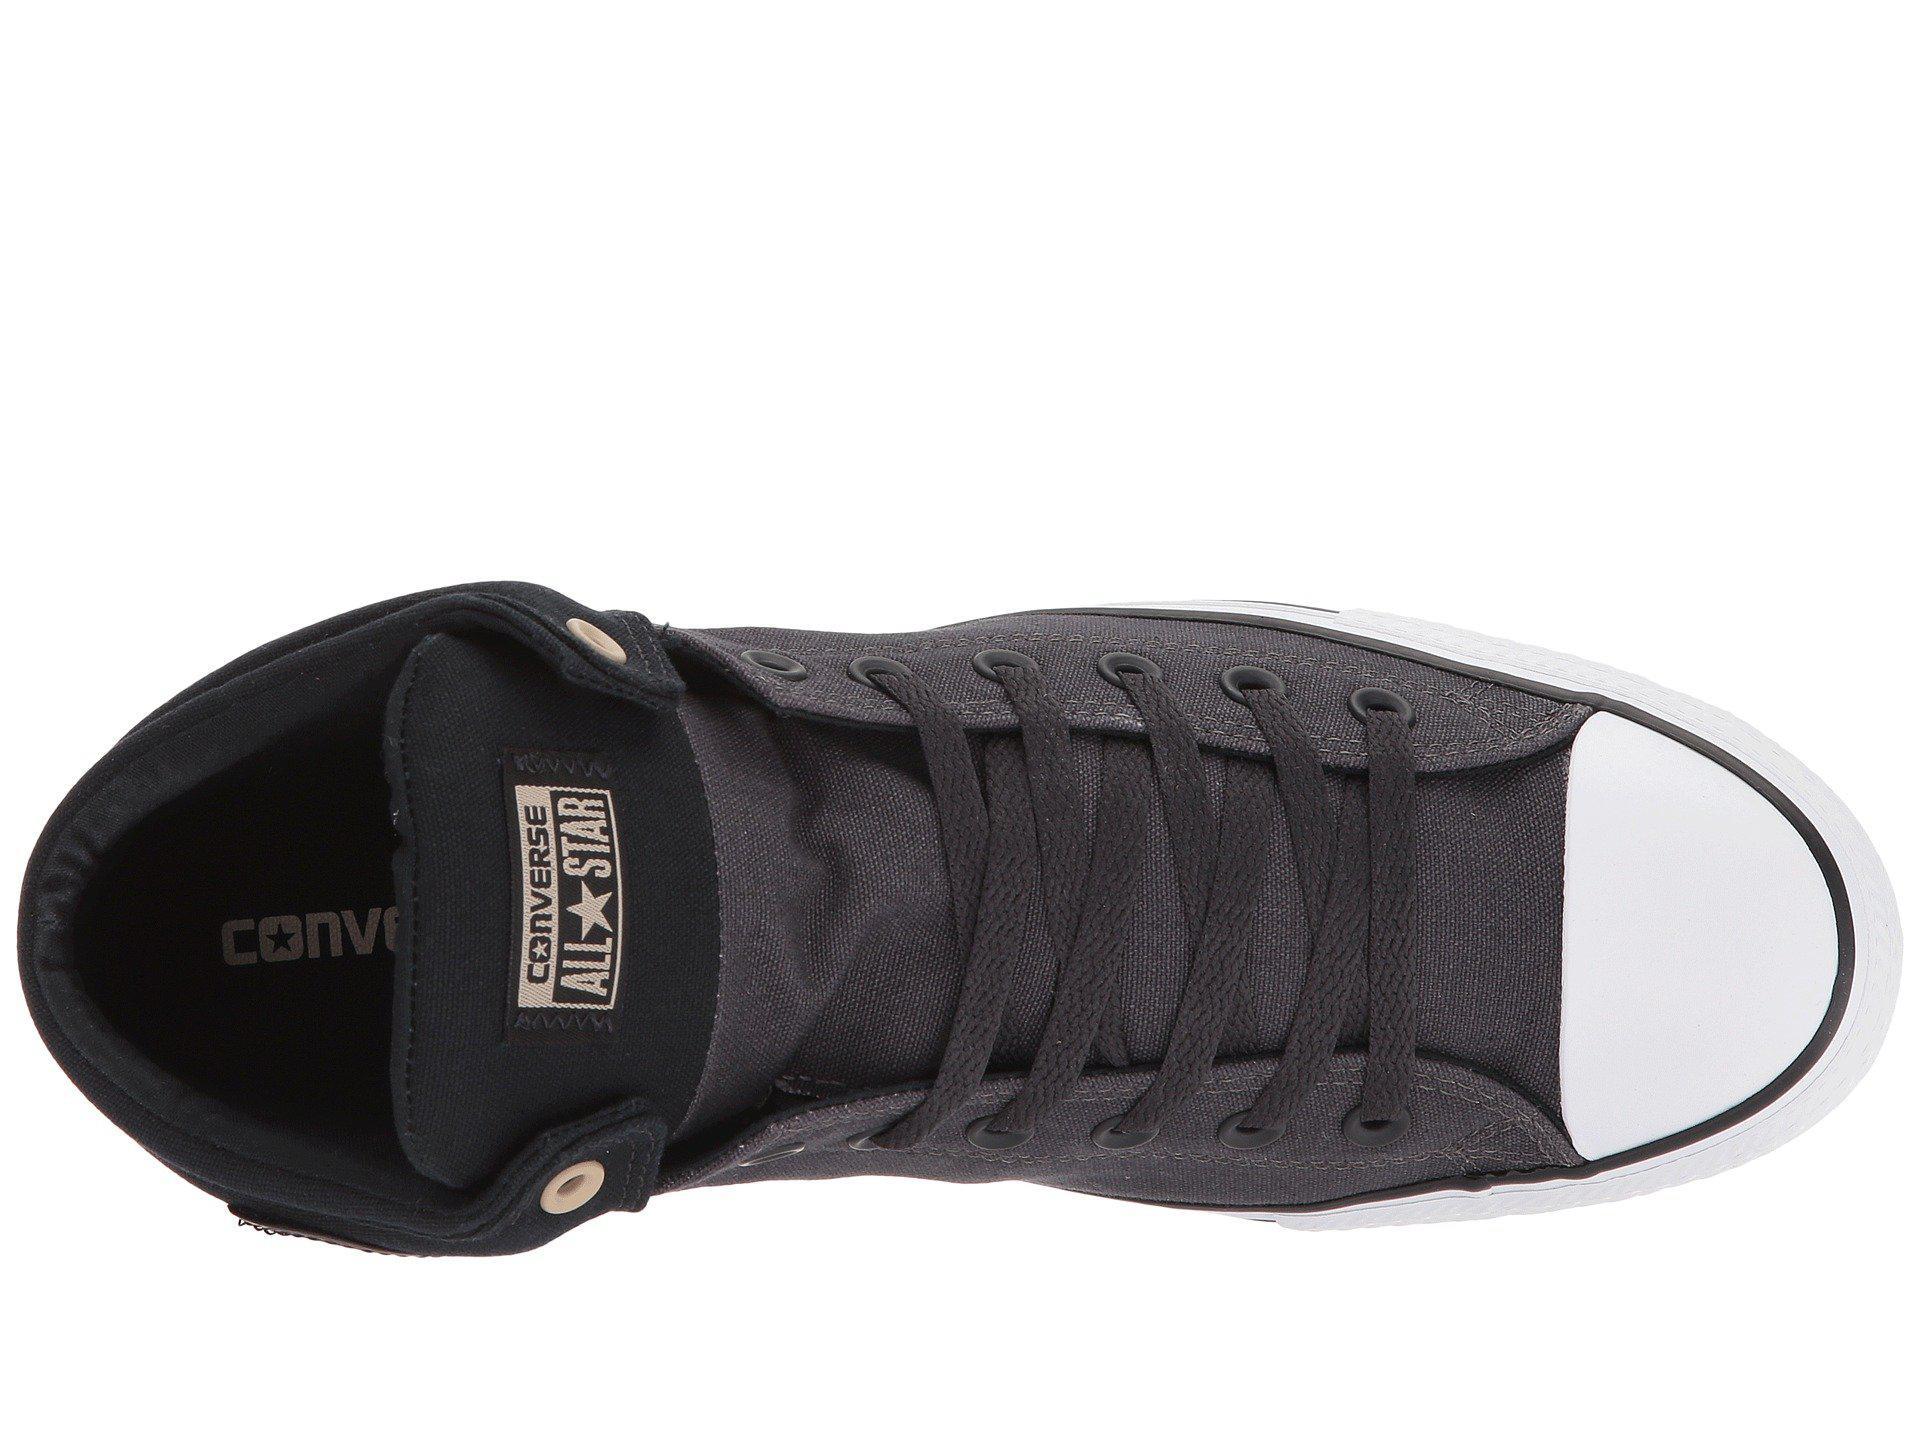 Lyst - Converse Chuck Taylor® All Star® High Street Mid in Black for Men 1eb843da2